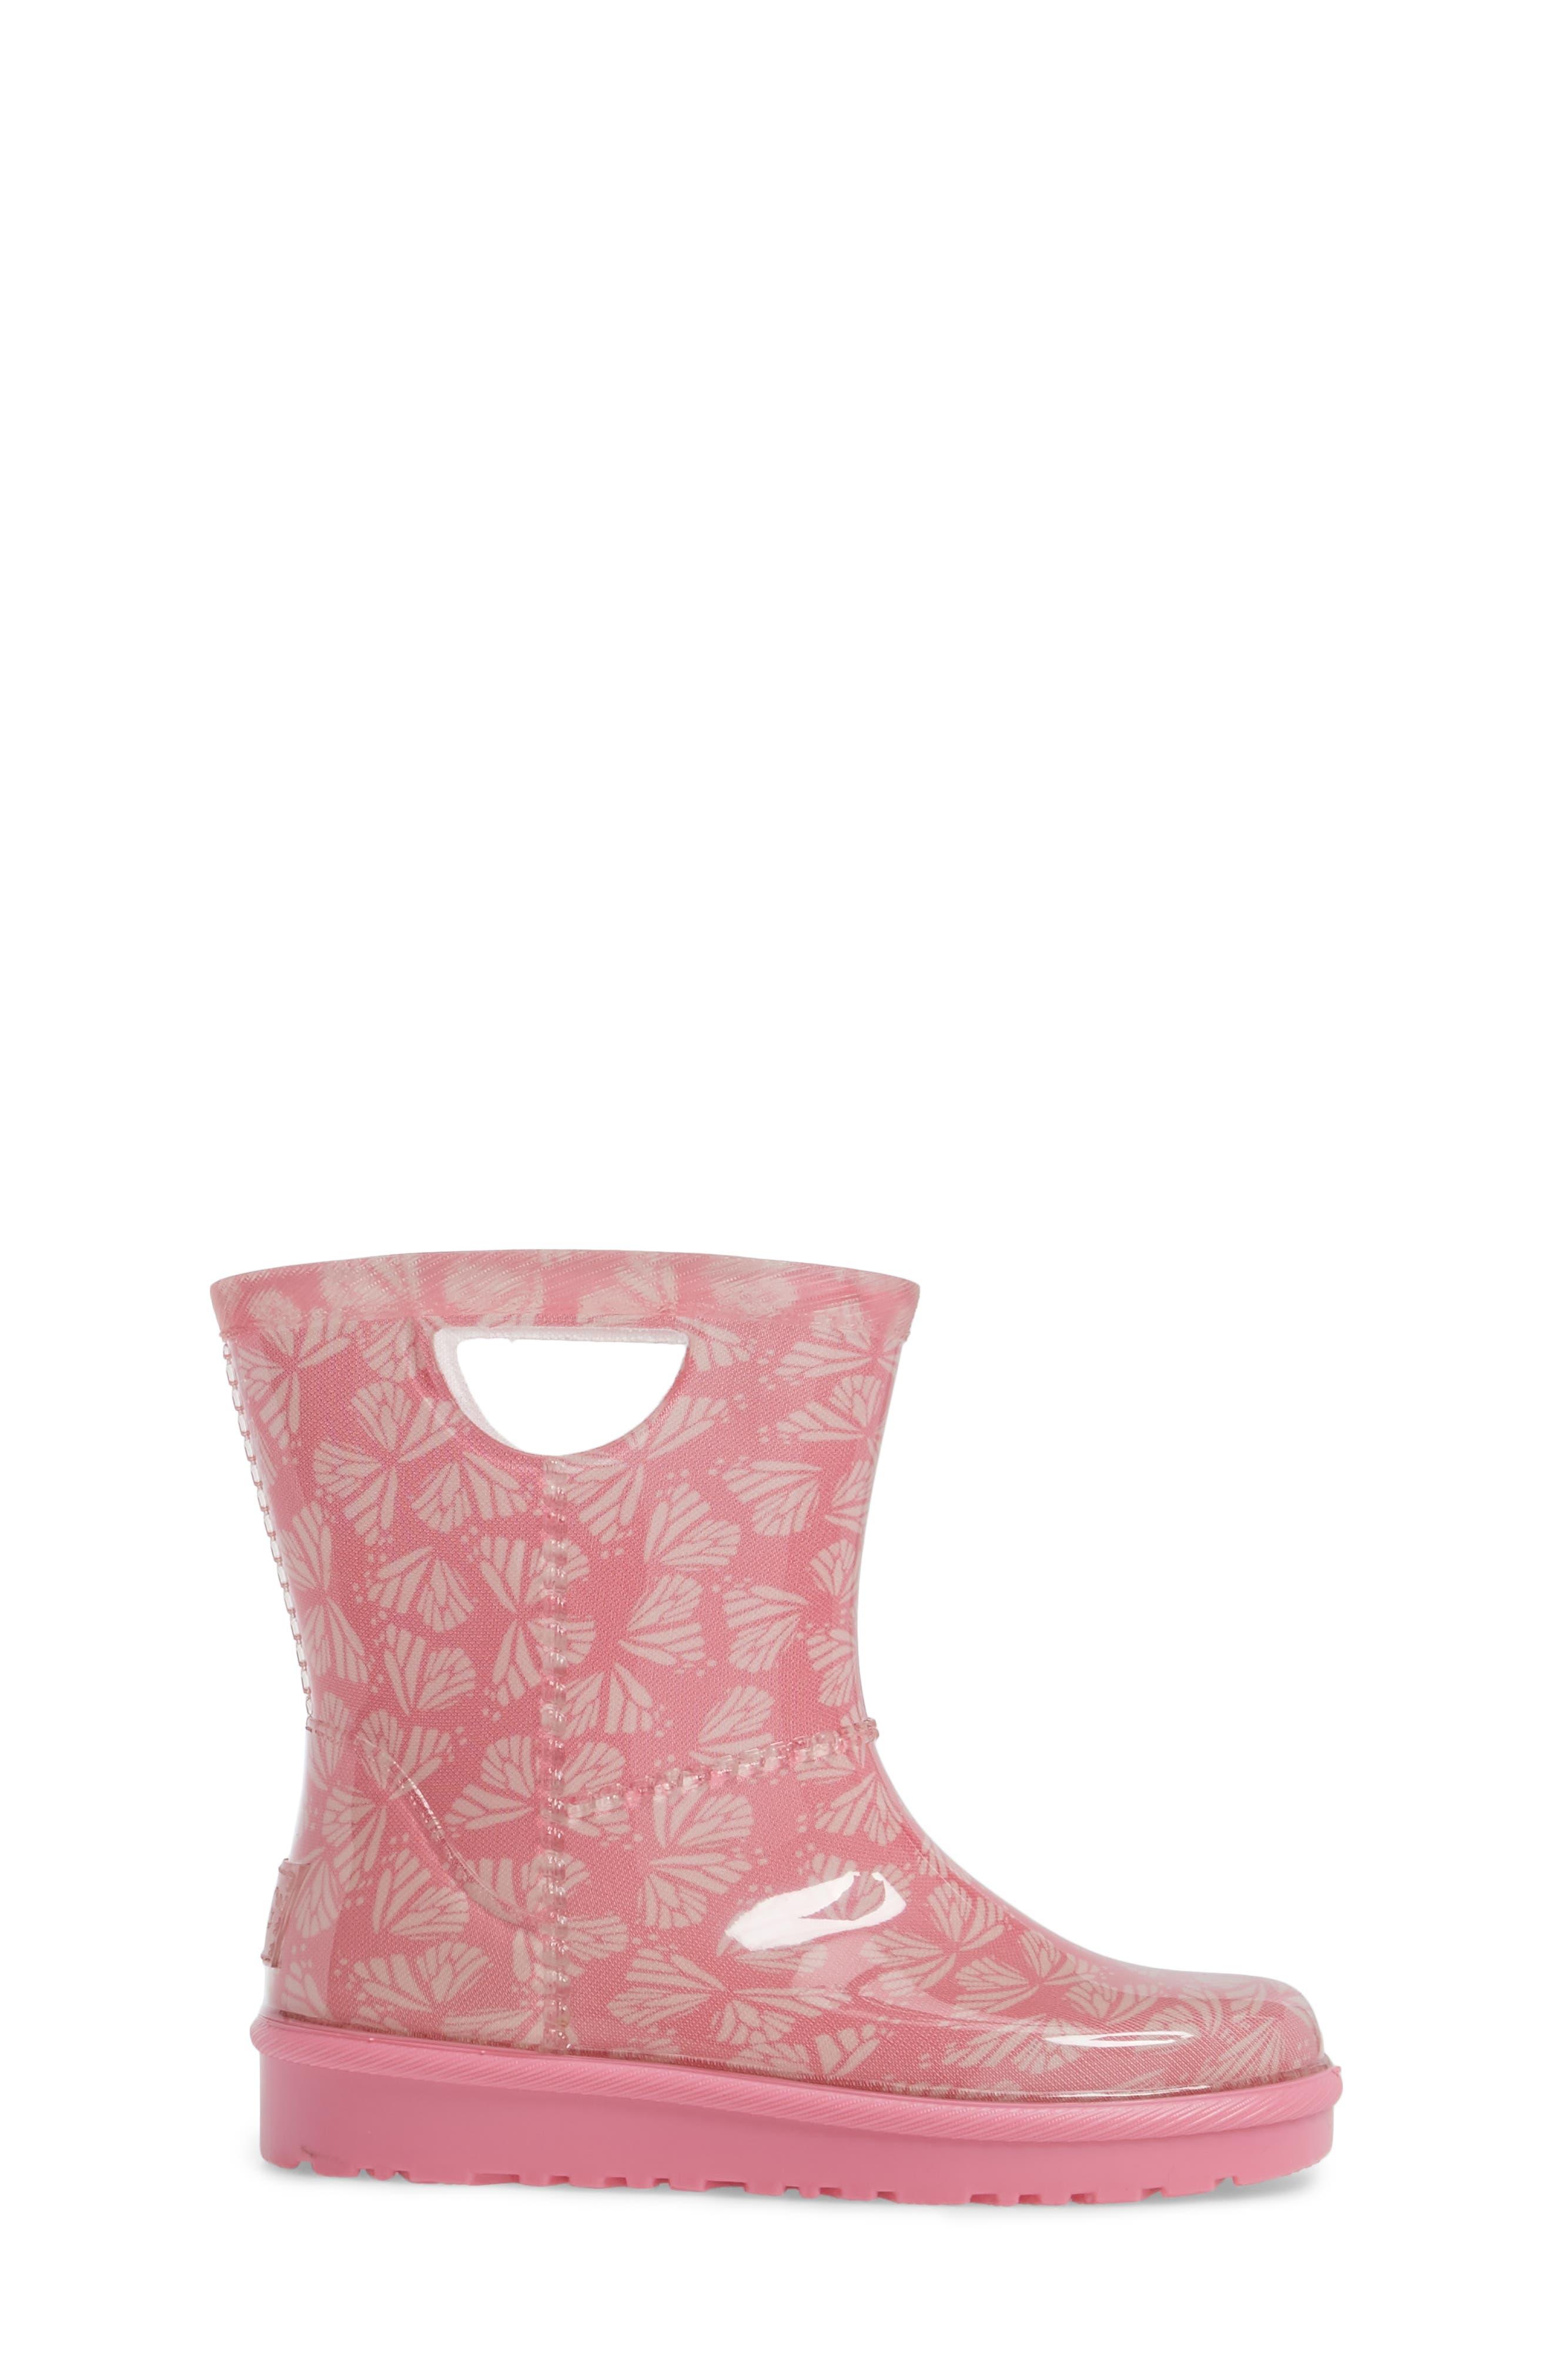 Rahjee Rain Boot,                             Alternate thumbnail 3, color,                             Pink Azalea